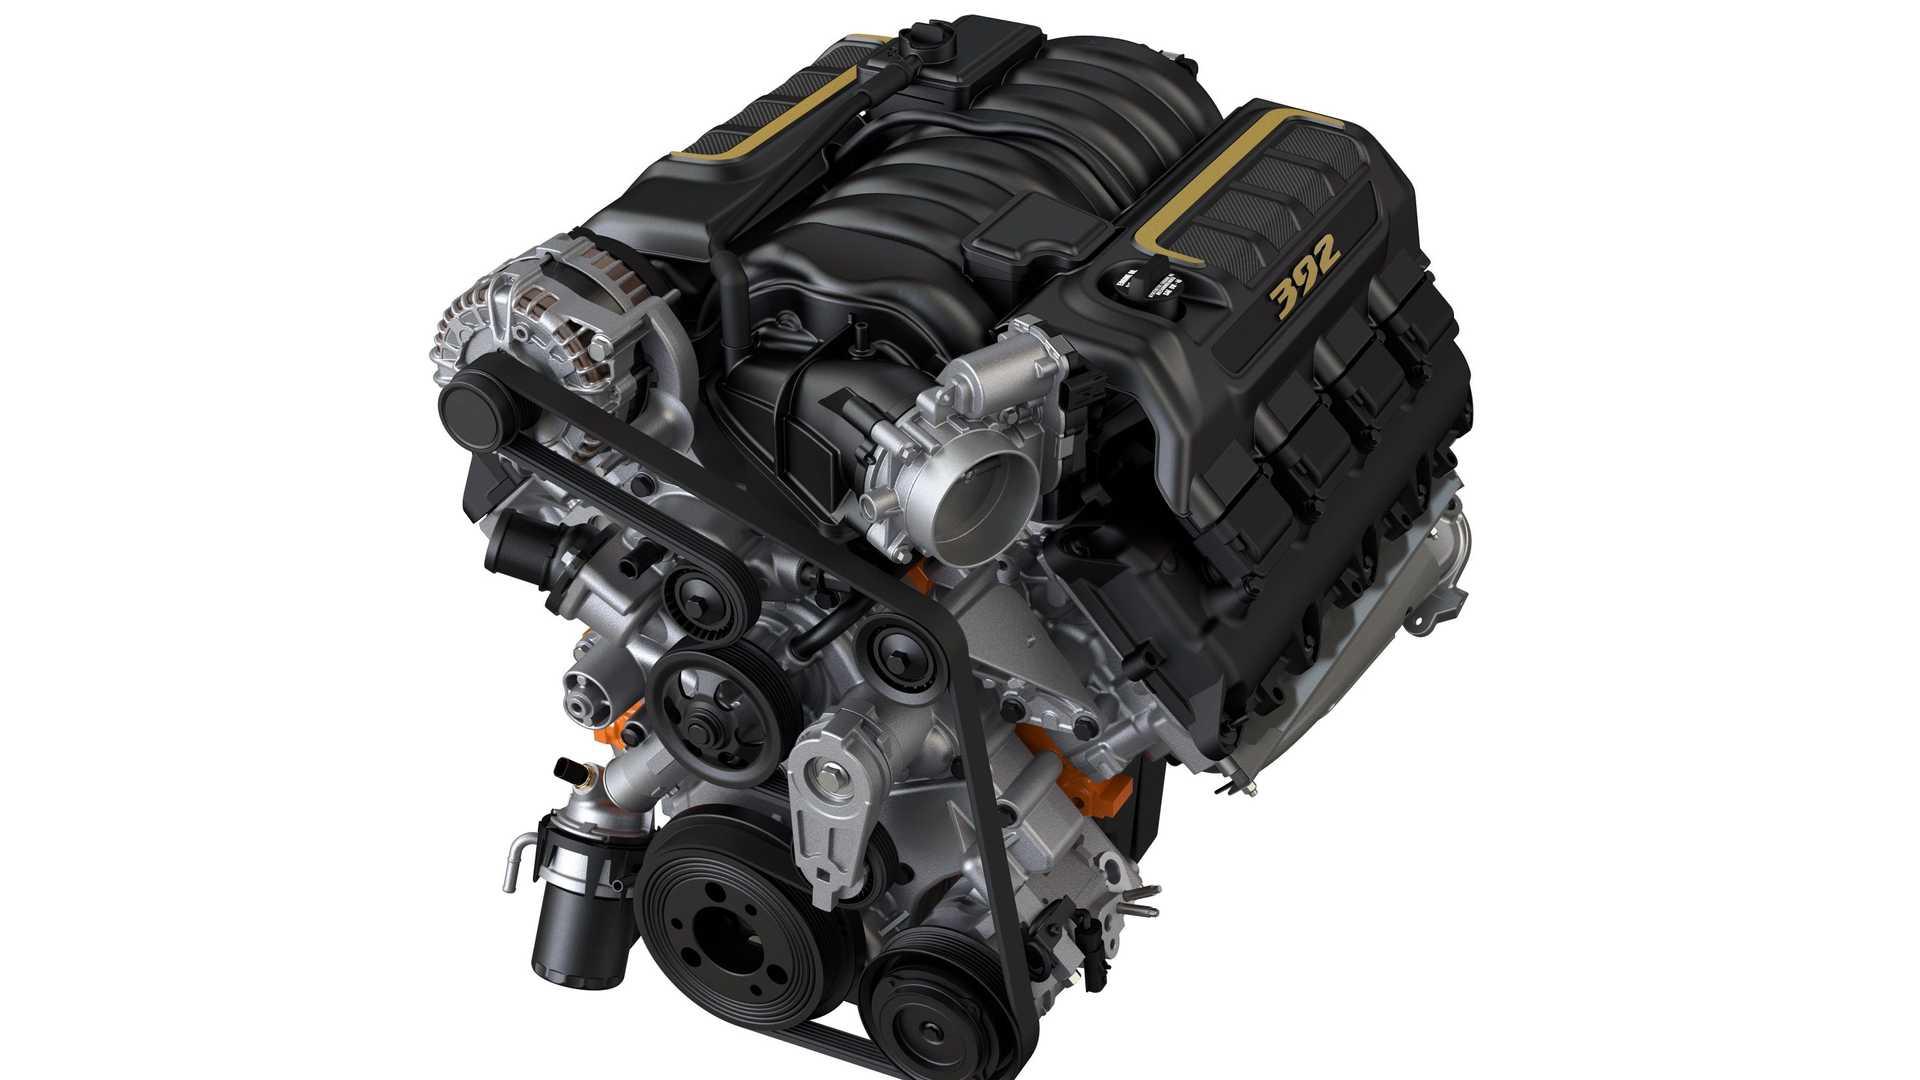 2021-jeep-wrangler-rubicon-392-engine-1